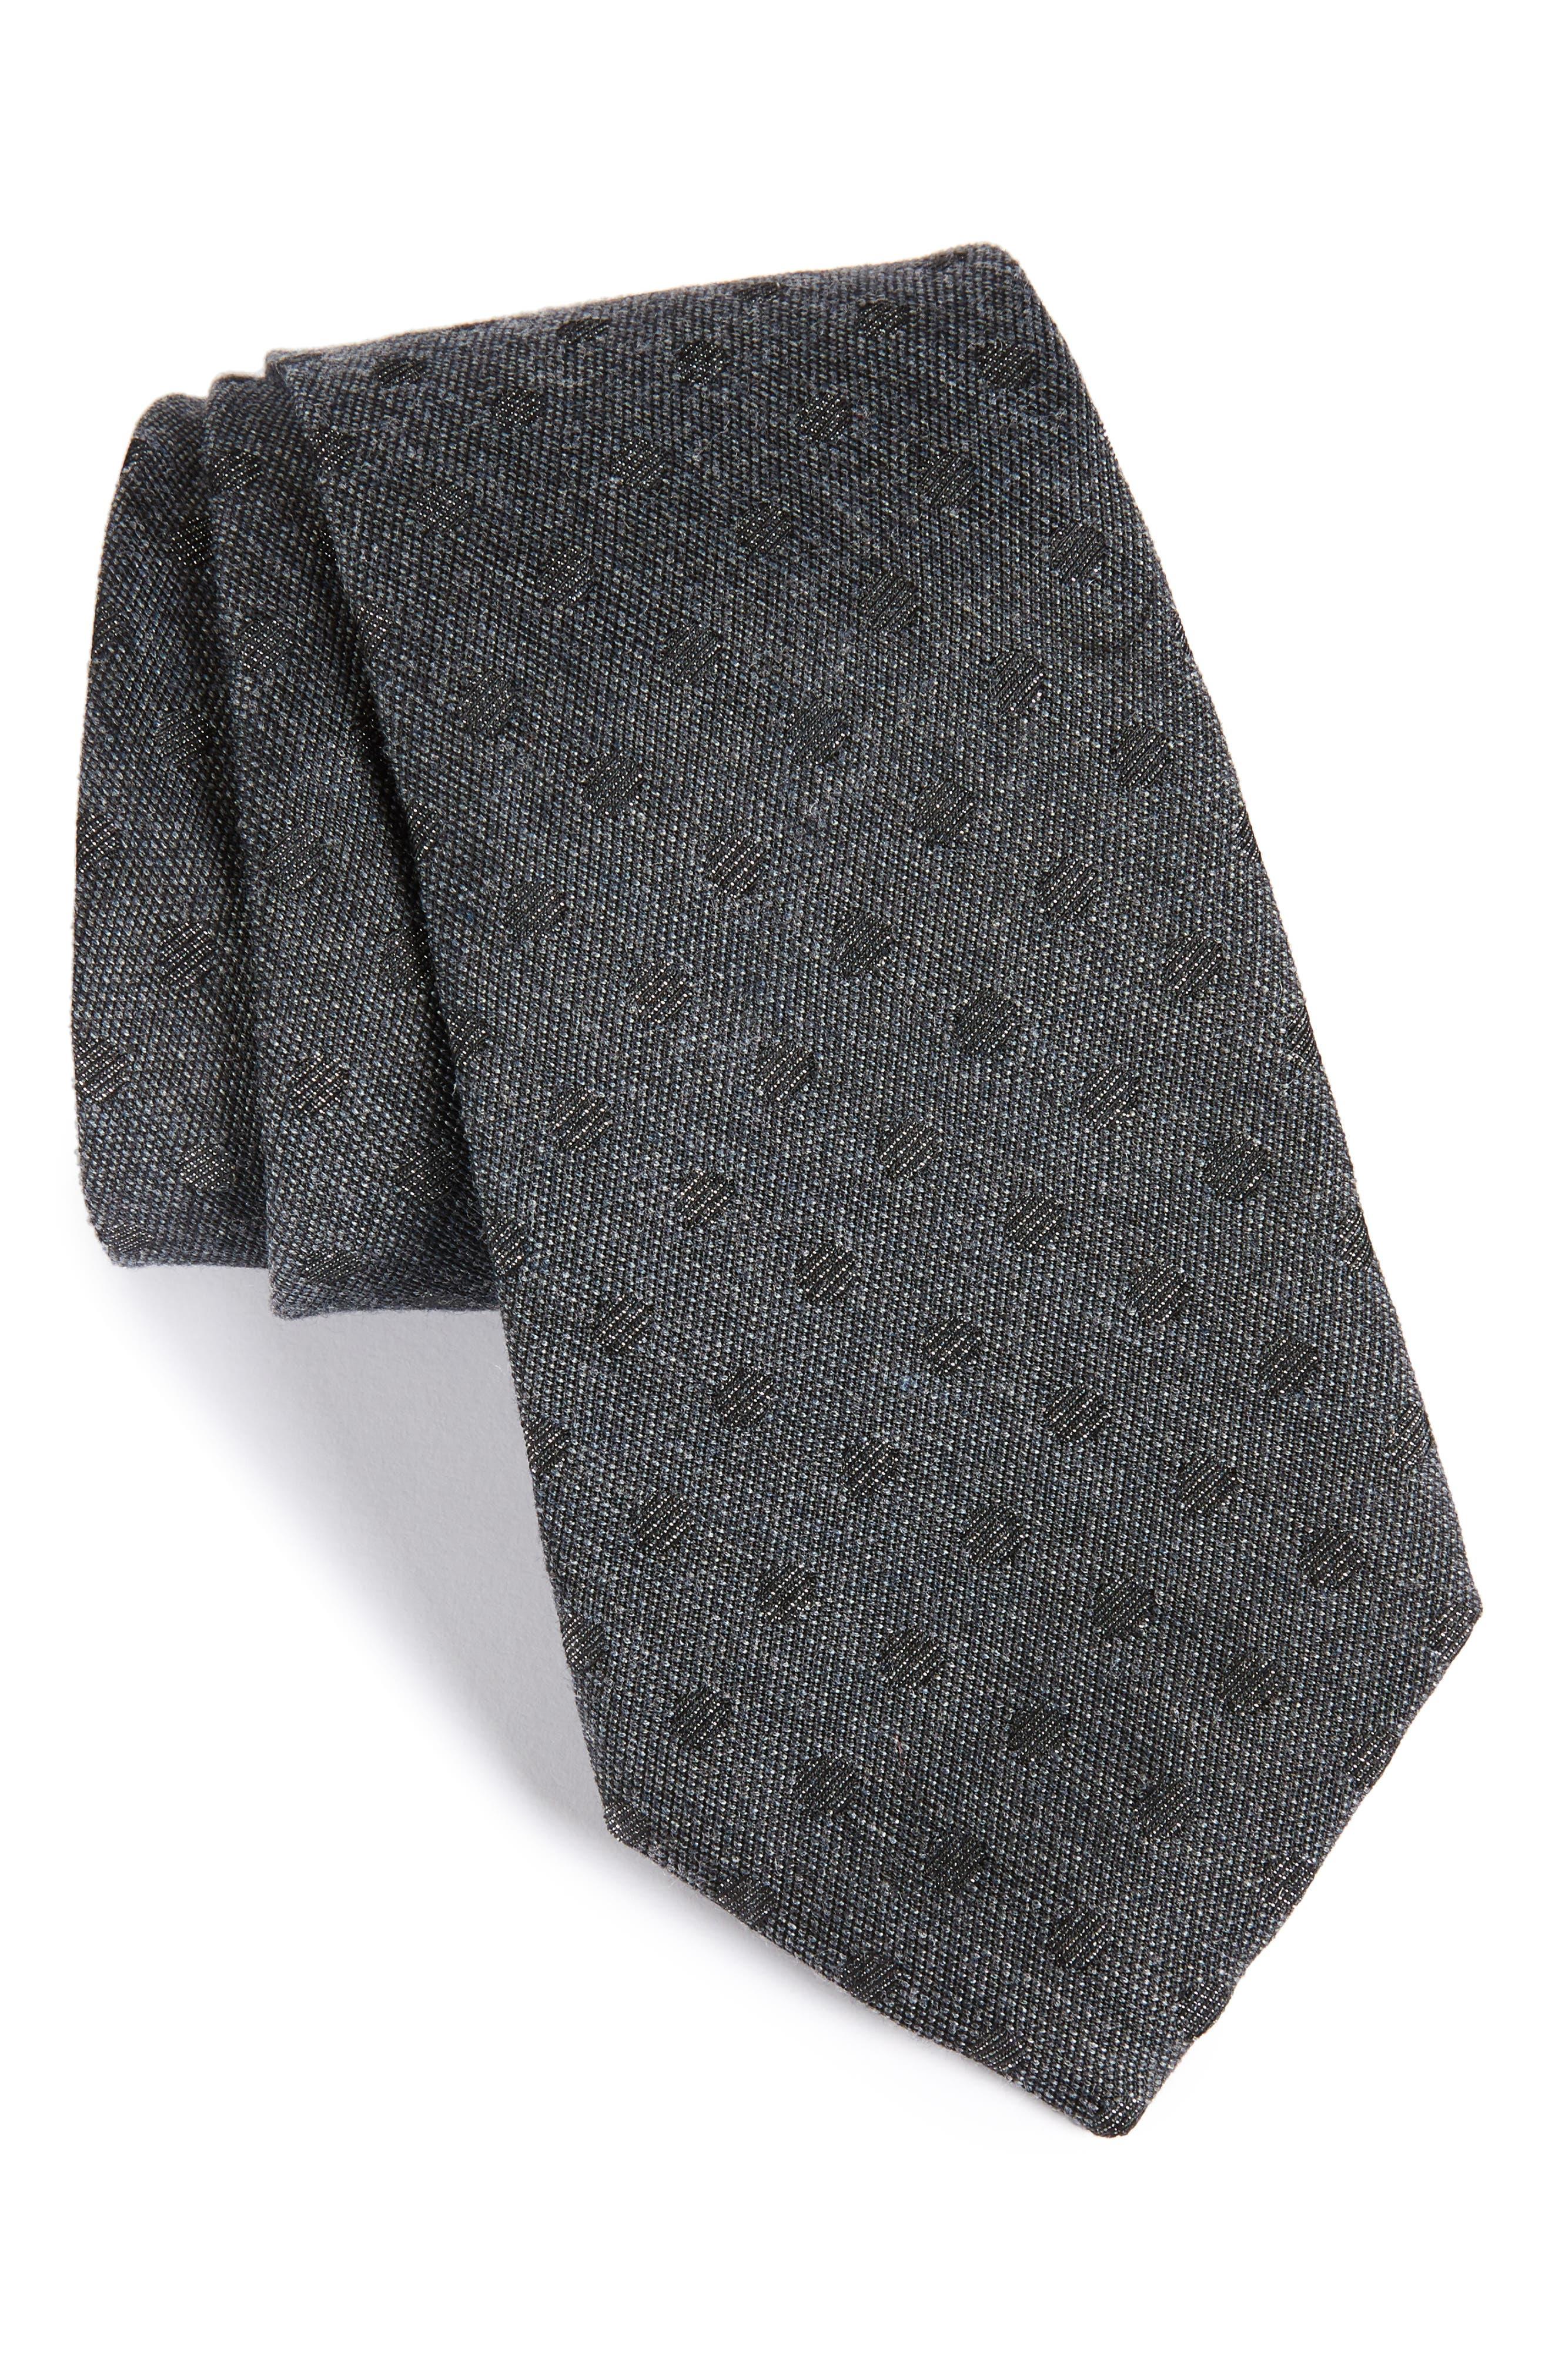 Main Image - Calibrate Lang Dot Tie